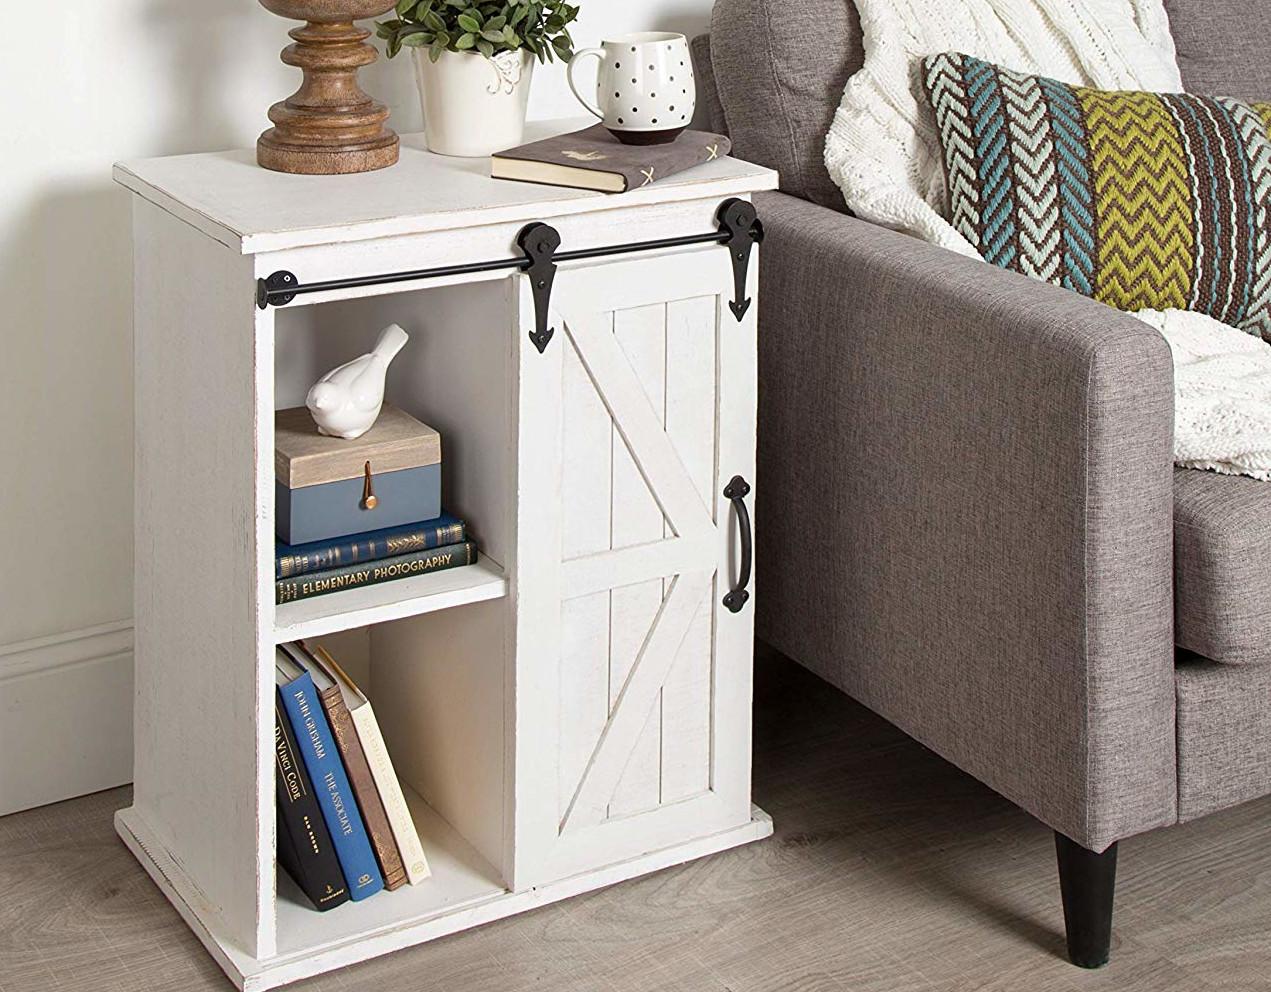 shiplap style nightstand